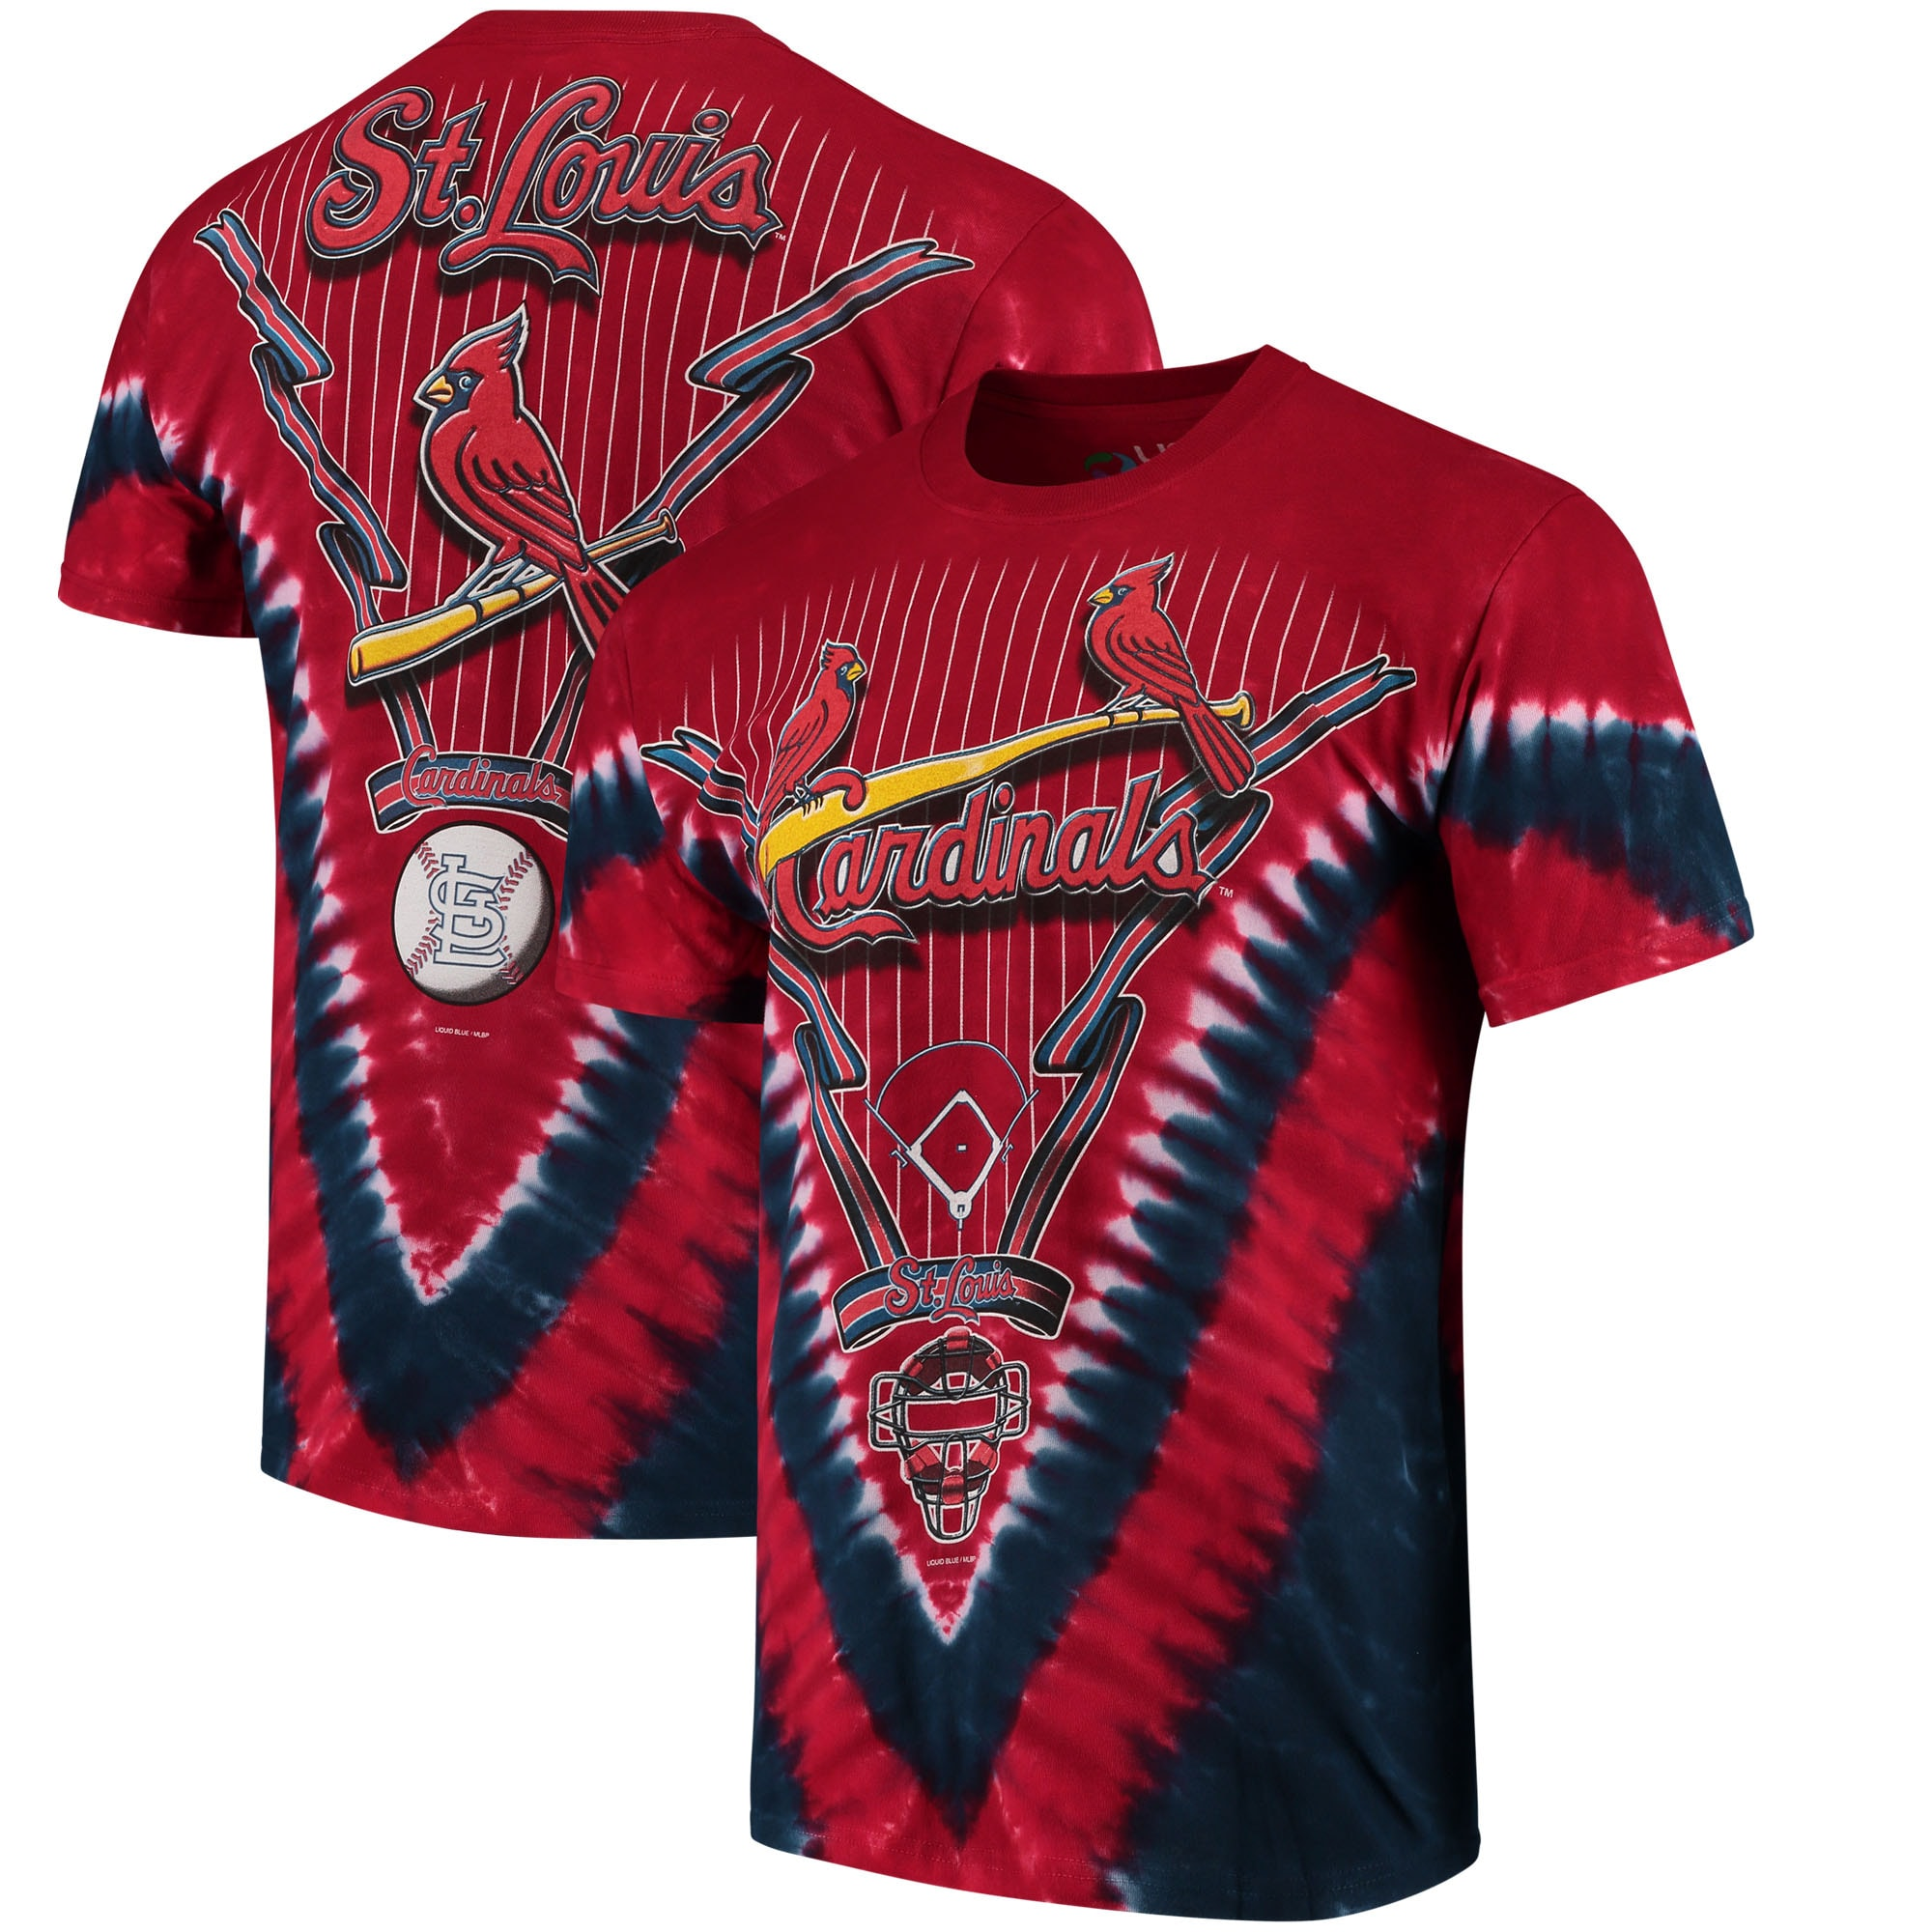 St. Louis Cardinals Tie-Dye T-Shirt - Red